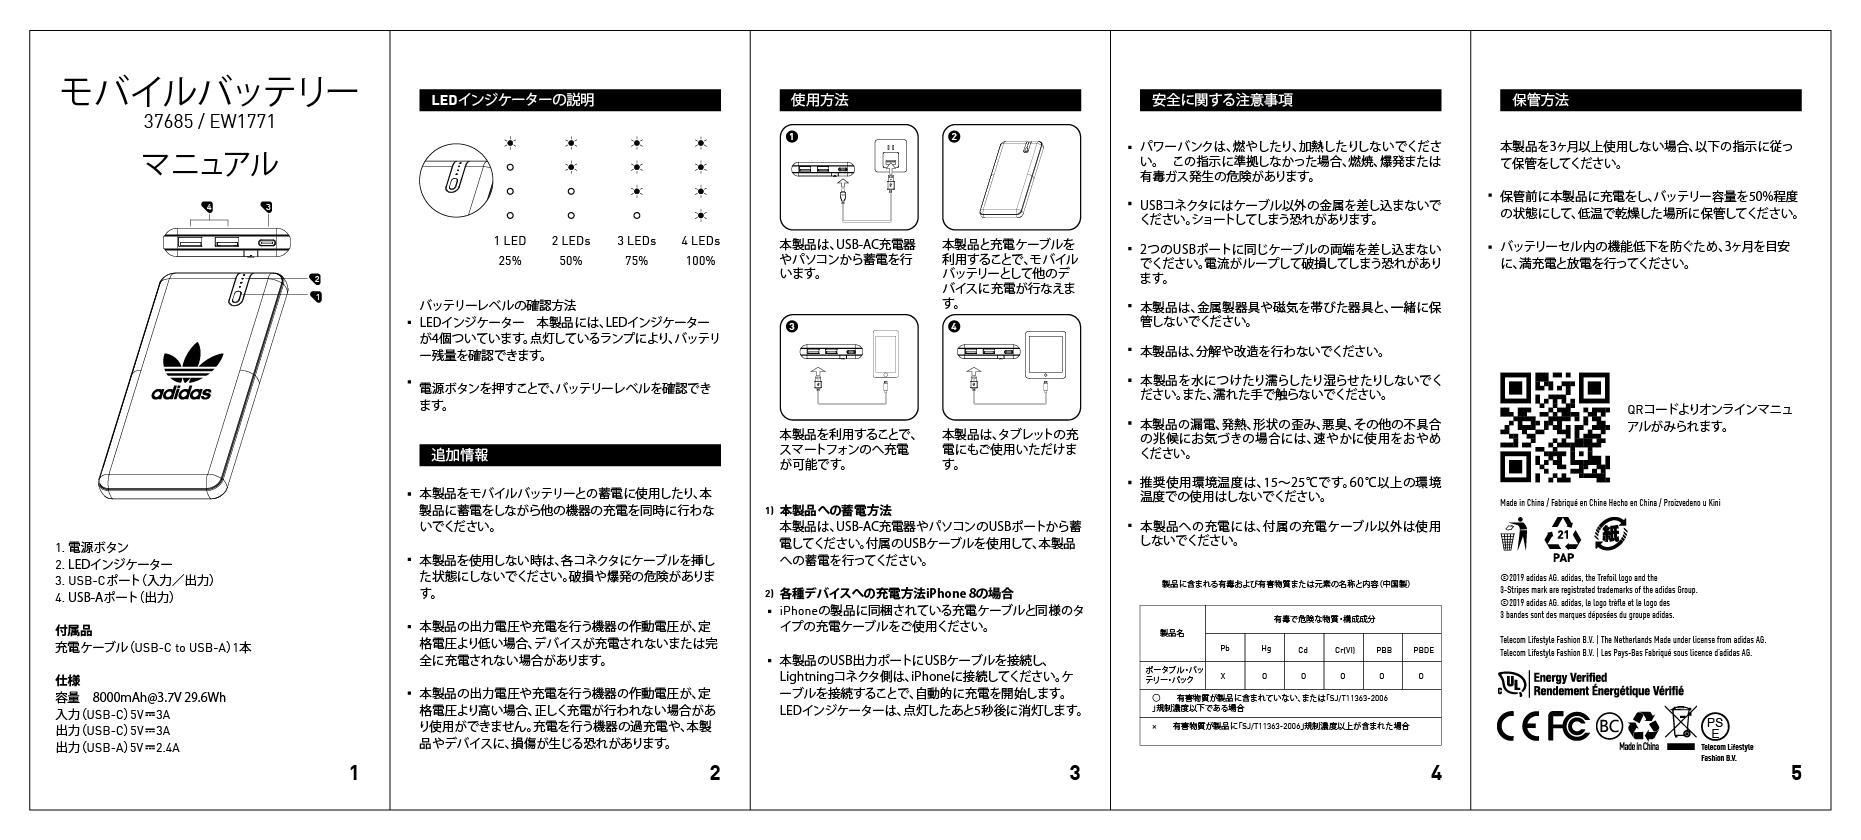 distancia telegrama Joya  adidas Powerbank Manual - JP : Help Center - adidascases.com - Telecom  Lifestyle Fashion